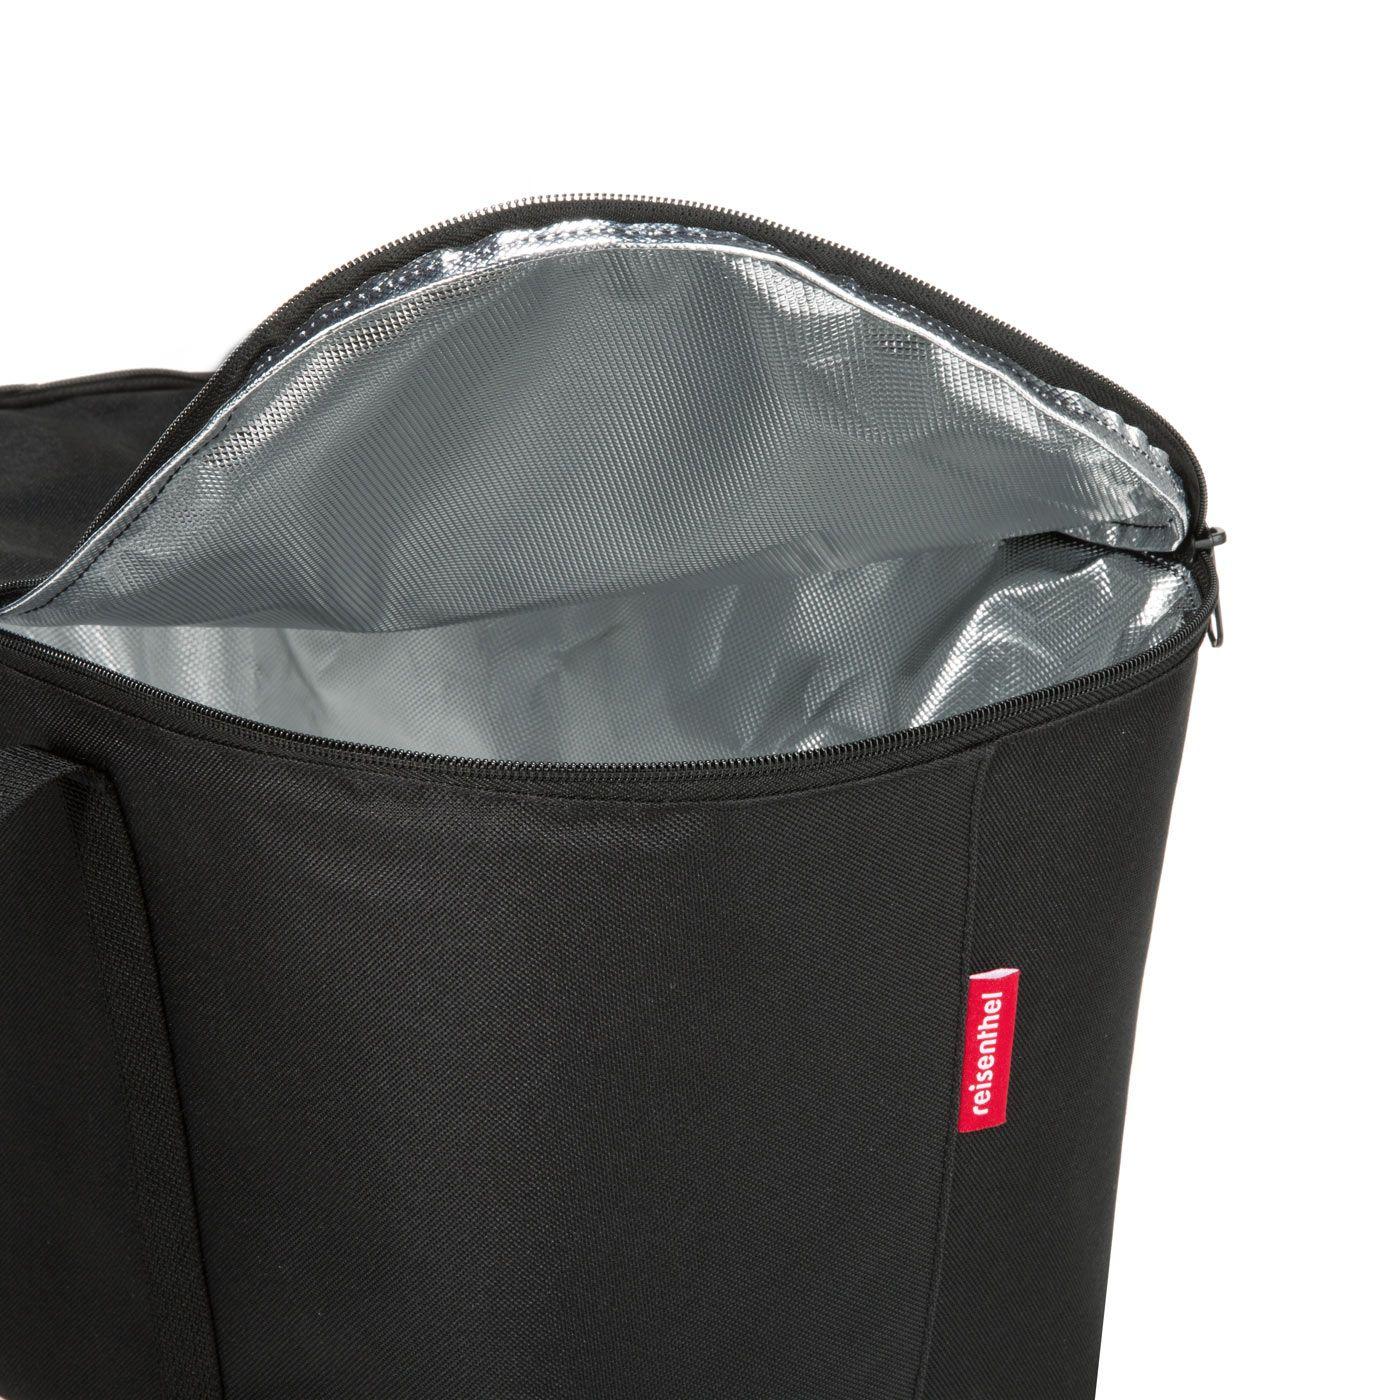 Rixen & Kaul Lenkertasche Iso Basket Bag schwarz